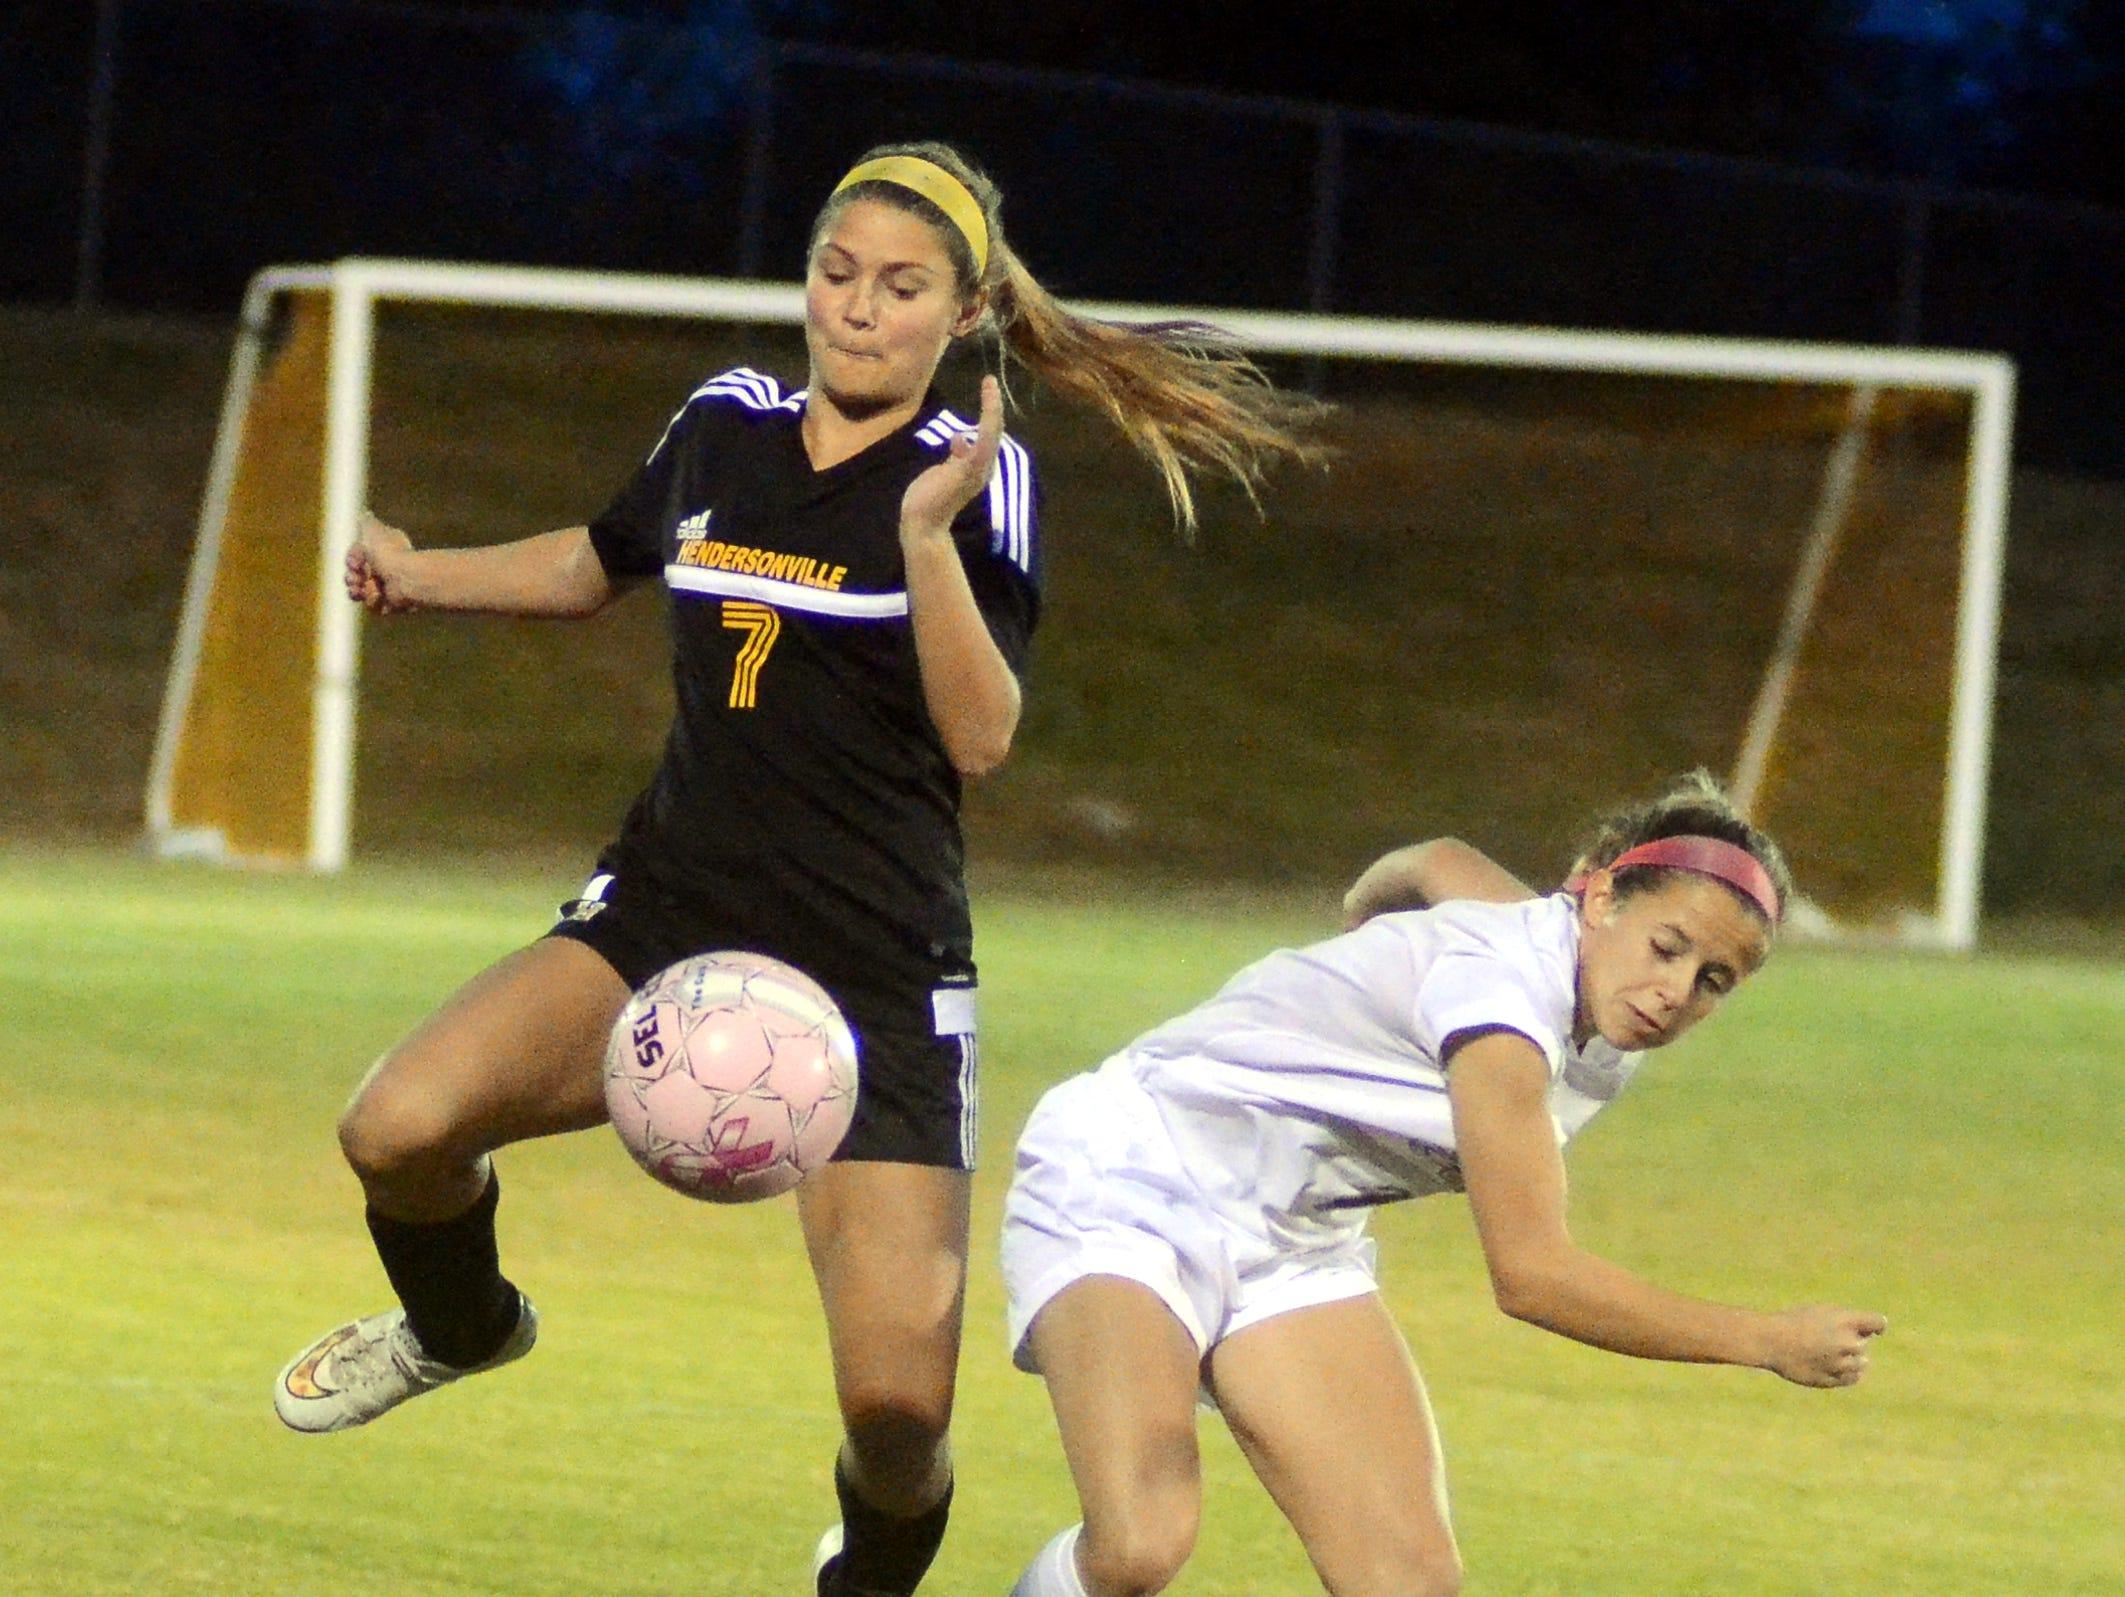 Hendersonville High junior Arden Butler battles with Independence junior Julie Garst for possession during first-half action.